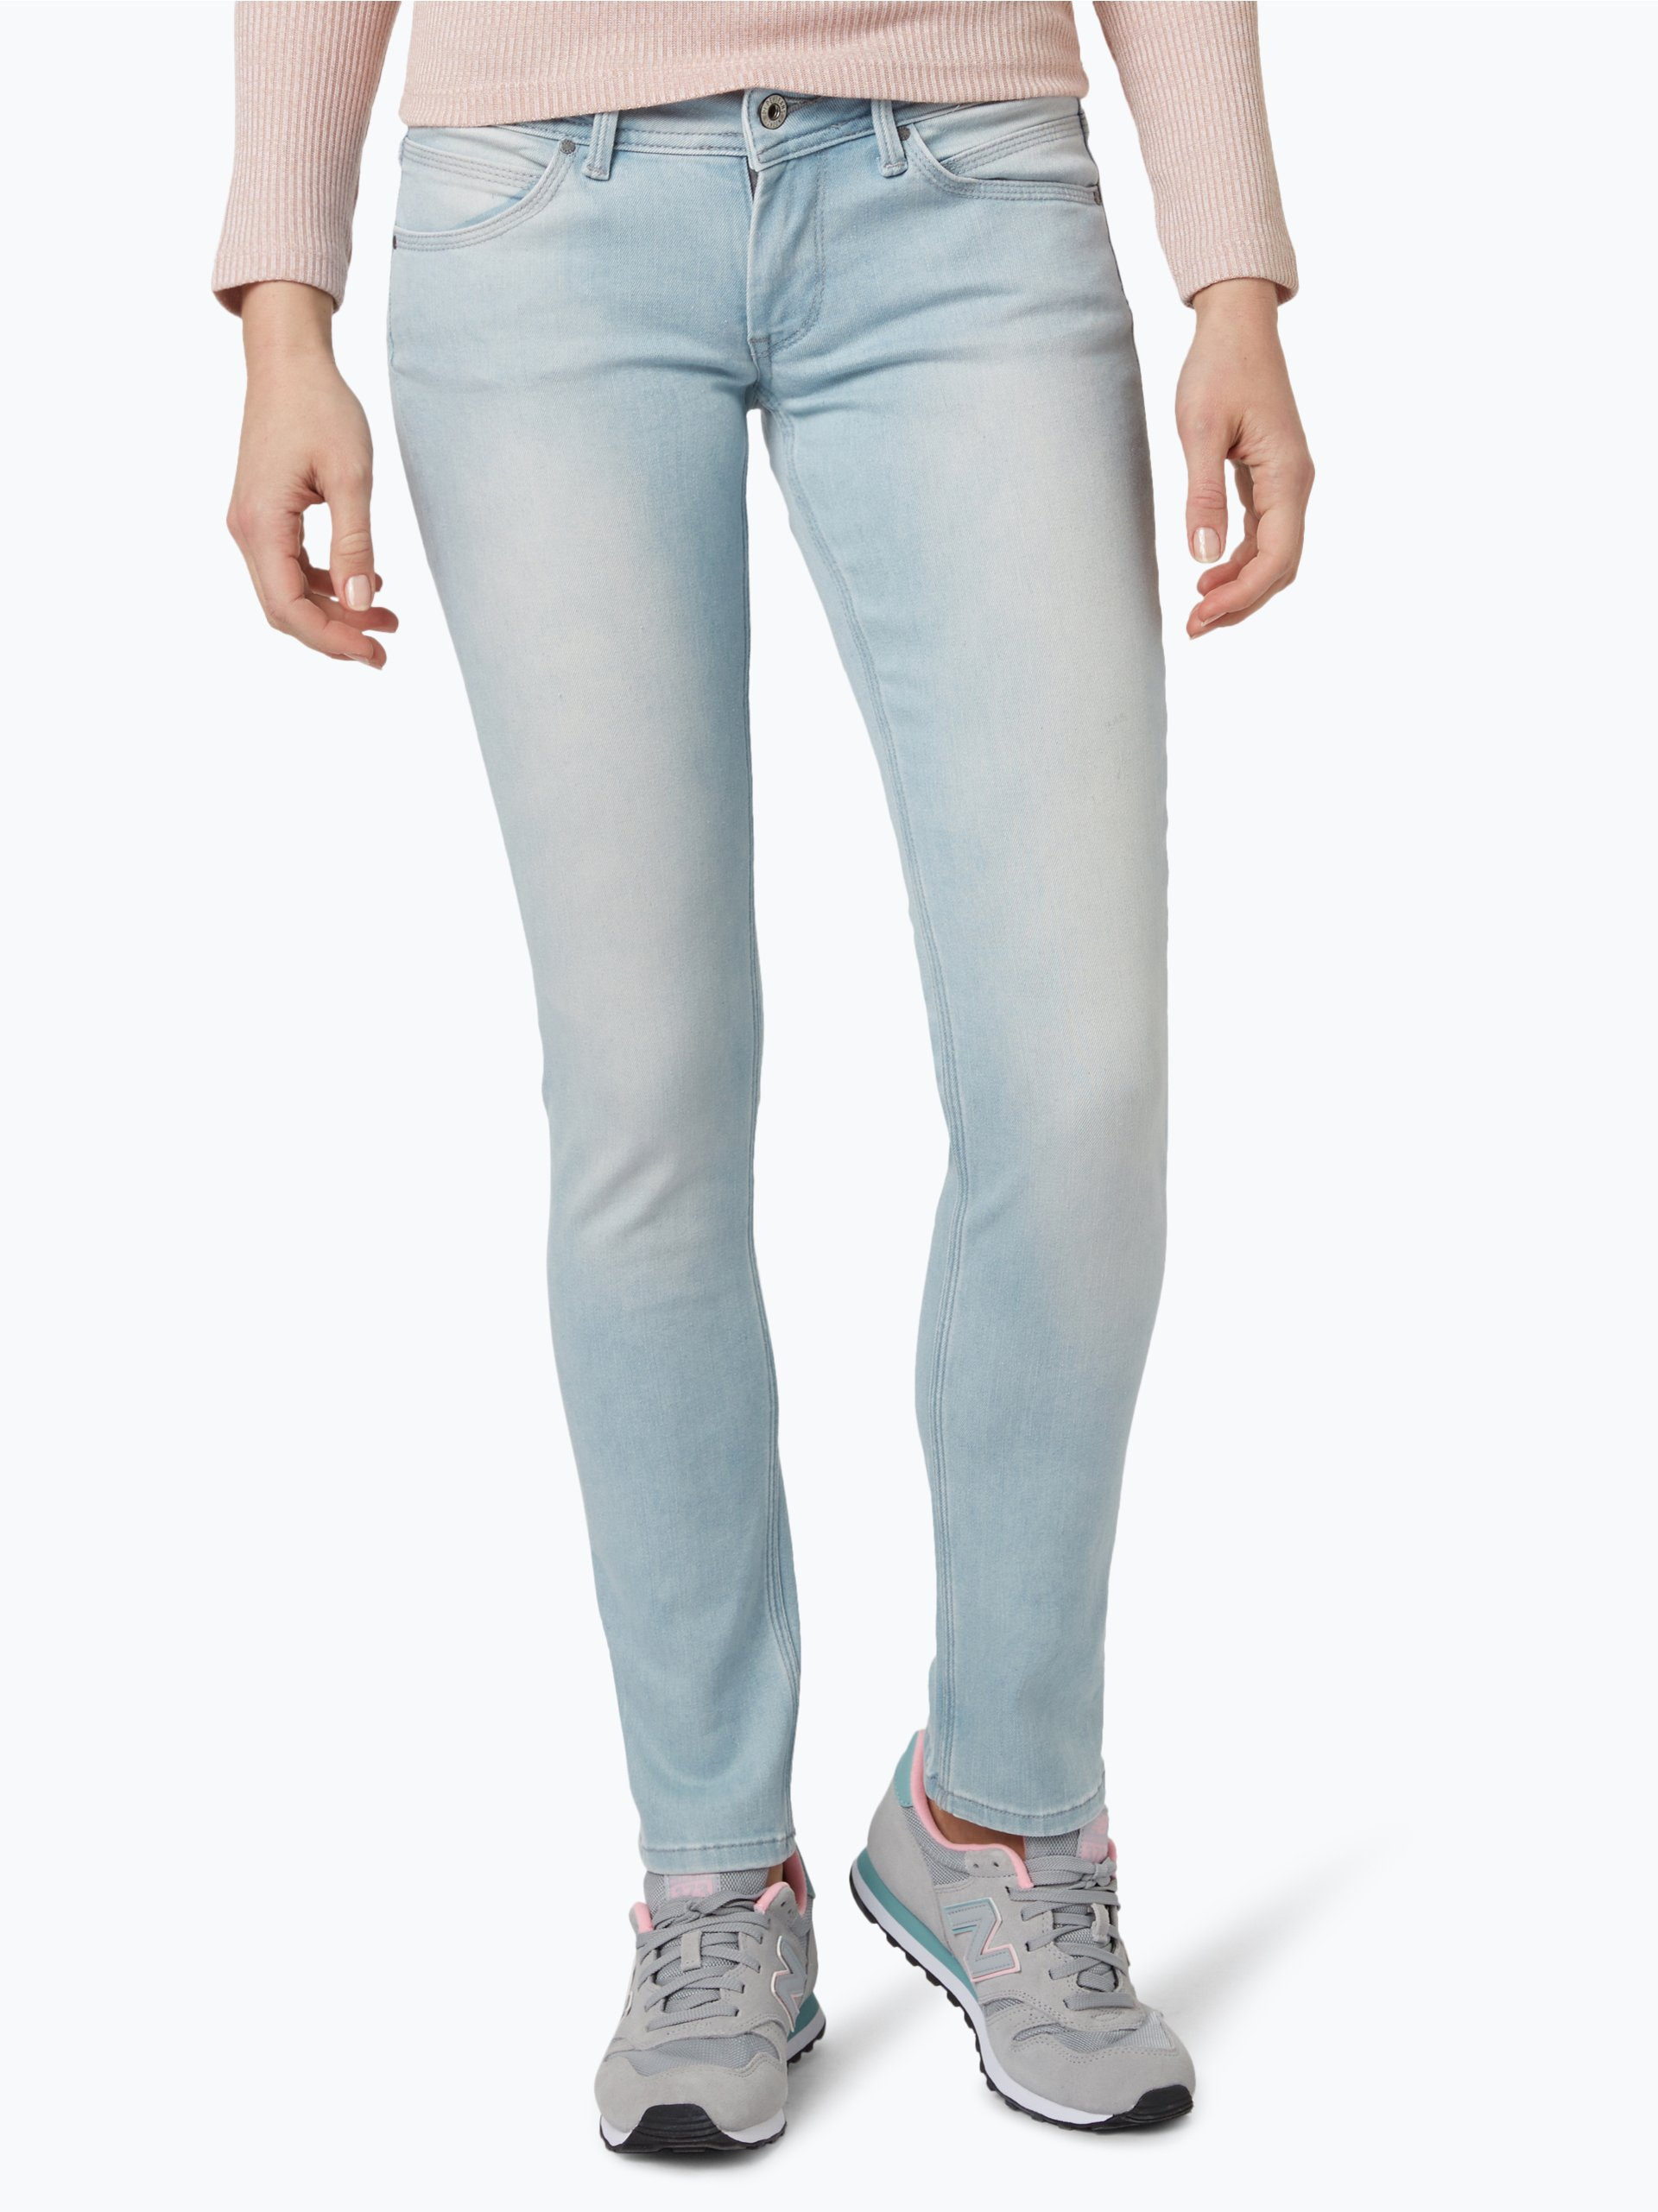 pepe jeans damen jeans ariel 2 online kaufen peek und cloppenburg de. Black Bedroom Furniture Sets. Home Design Ideas